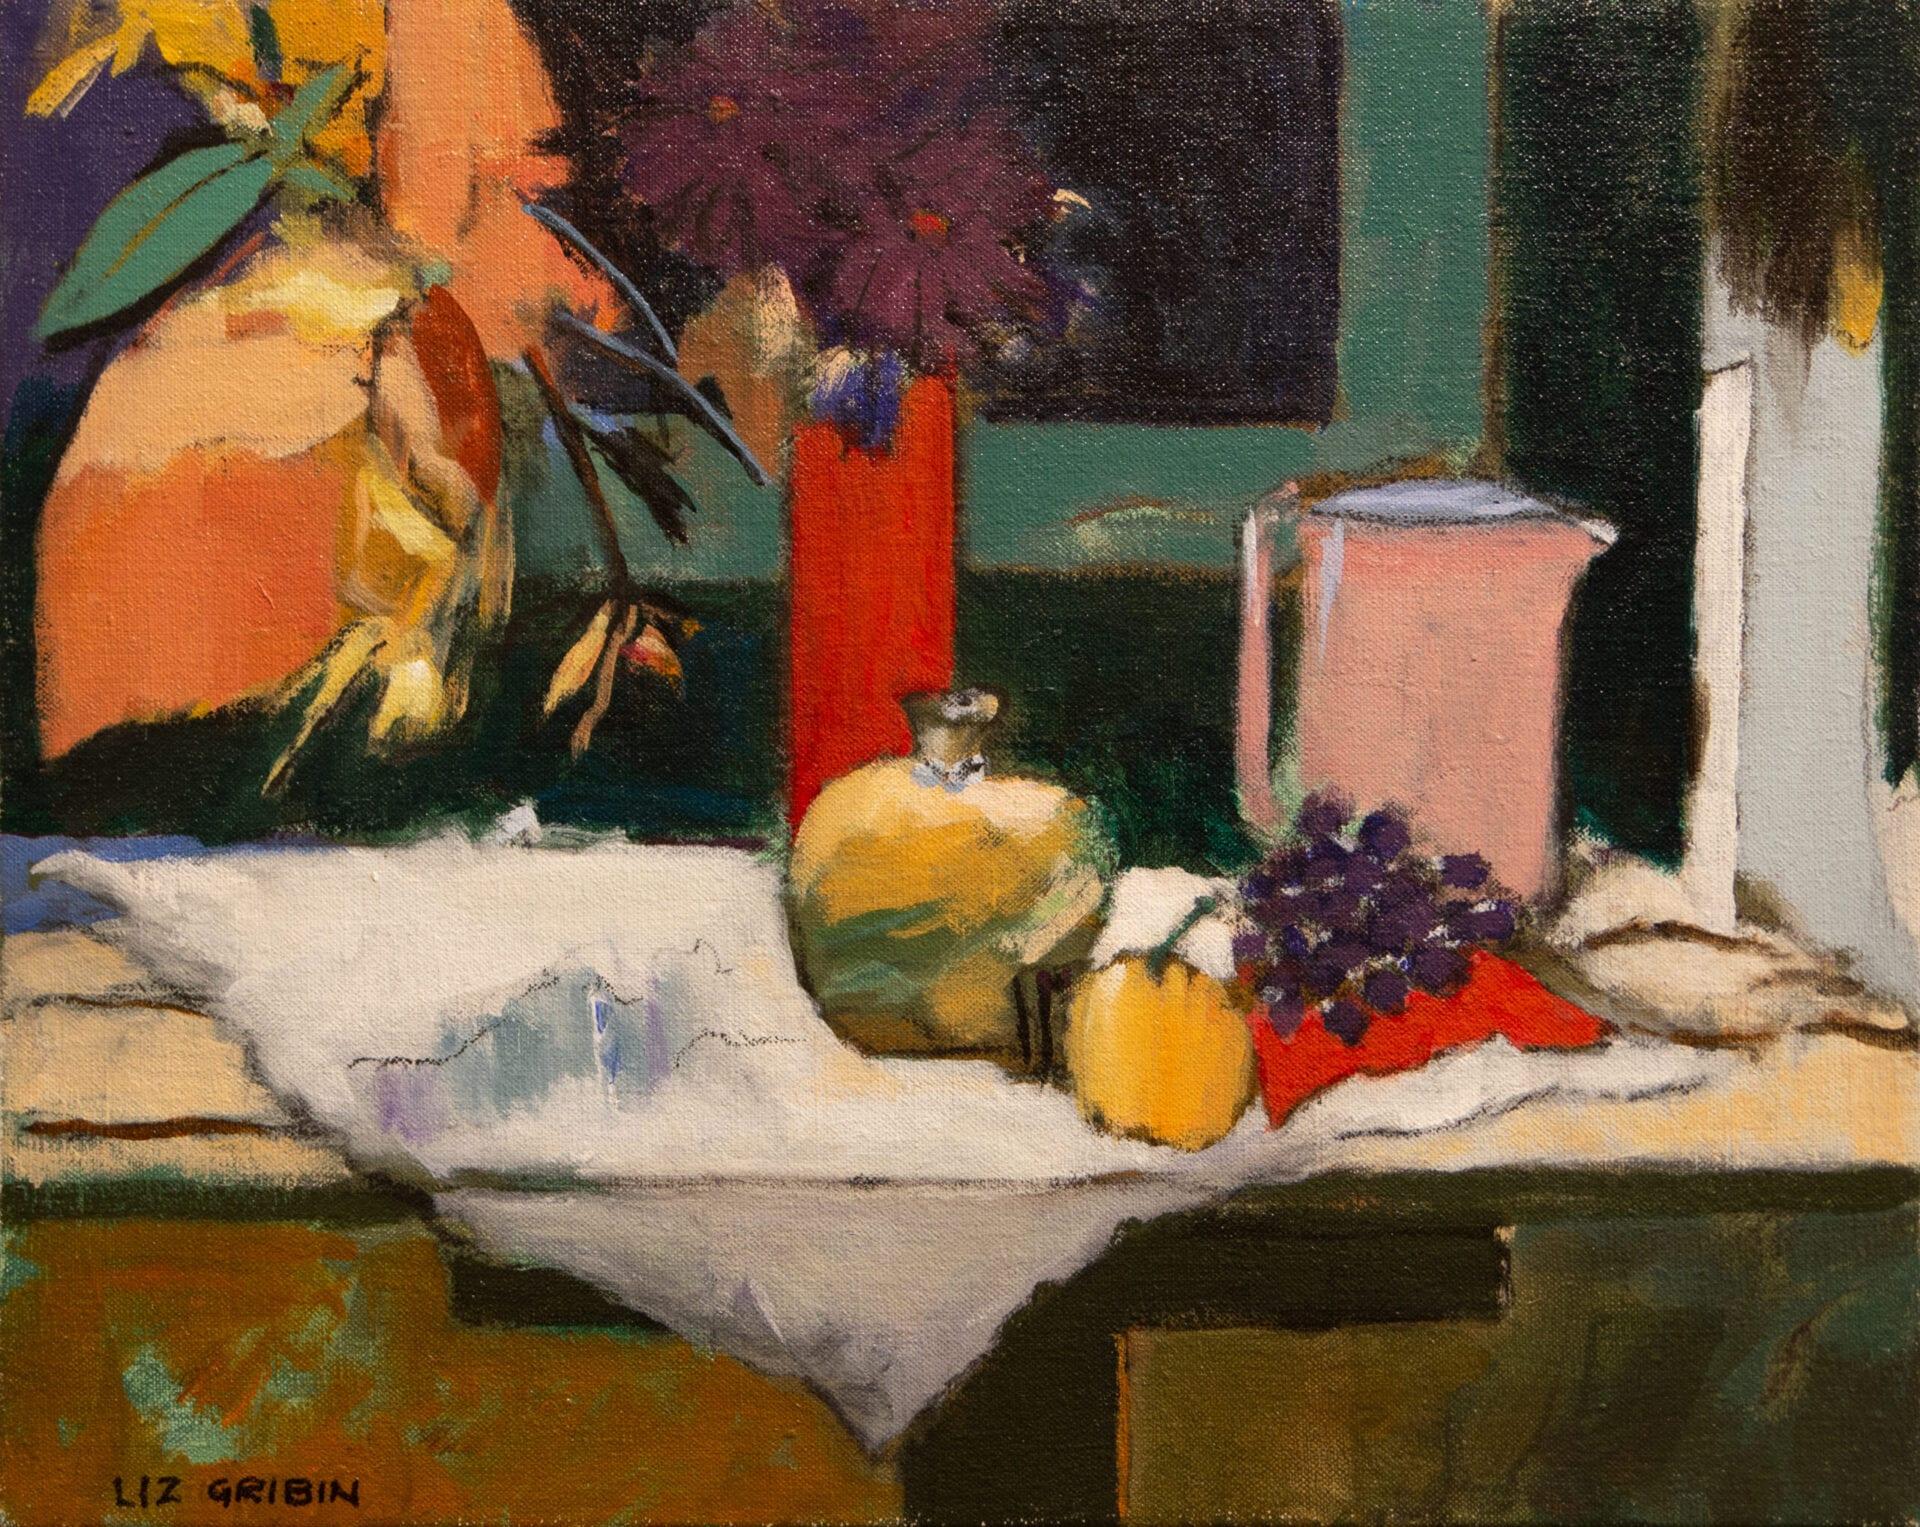 "A Small Green Room   Liz Gribin   Acrylic   16 x 20"""